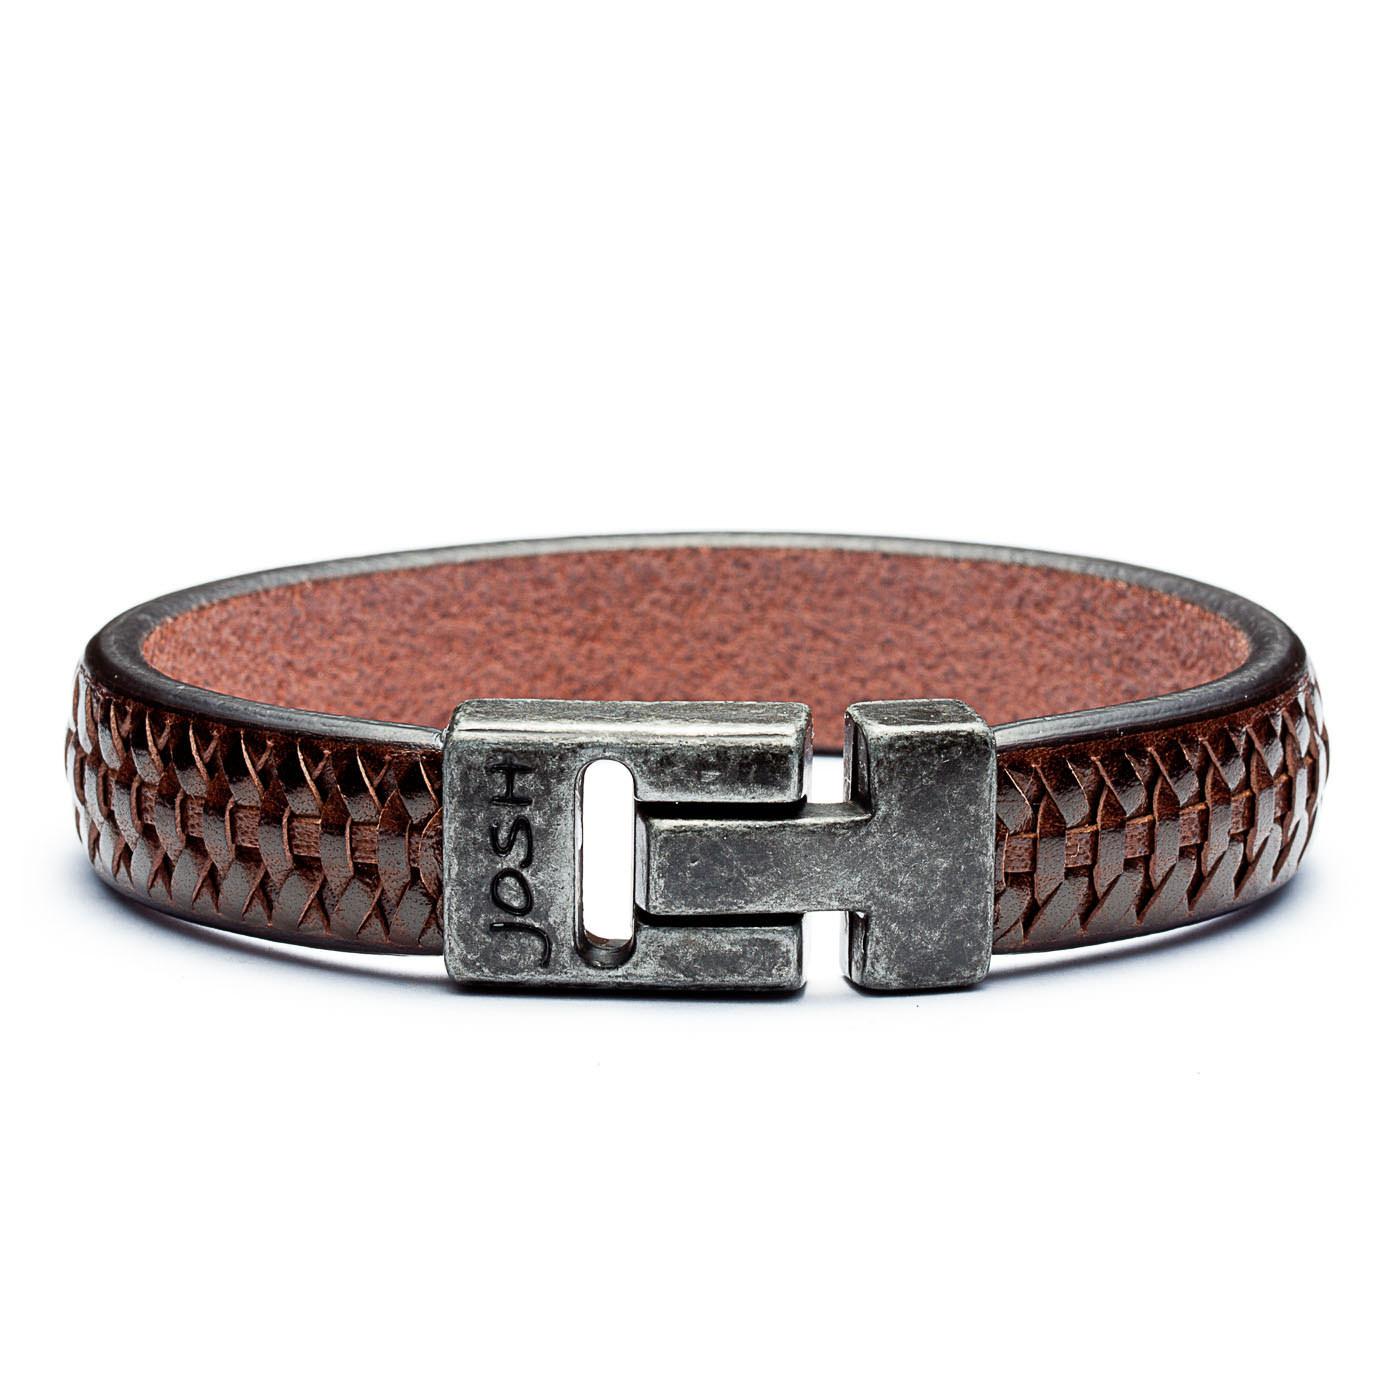 Josh Vintage Black Brown Armband 24535-BRA-VB-BROWN (Lengte: 20-22 cm)